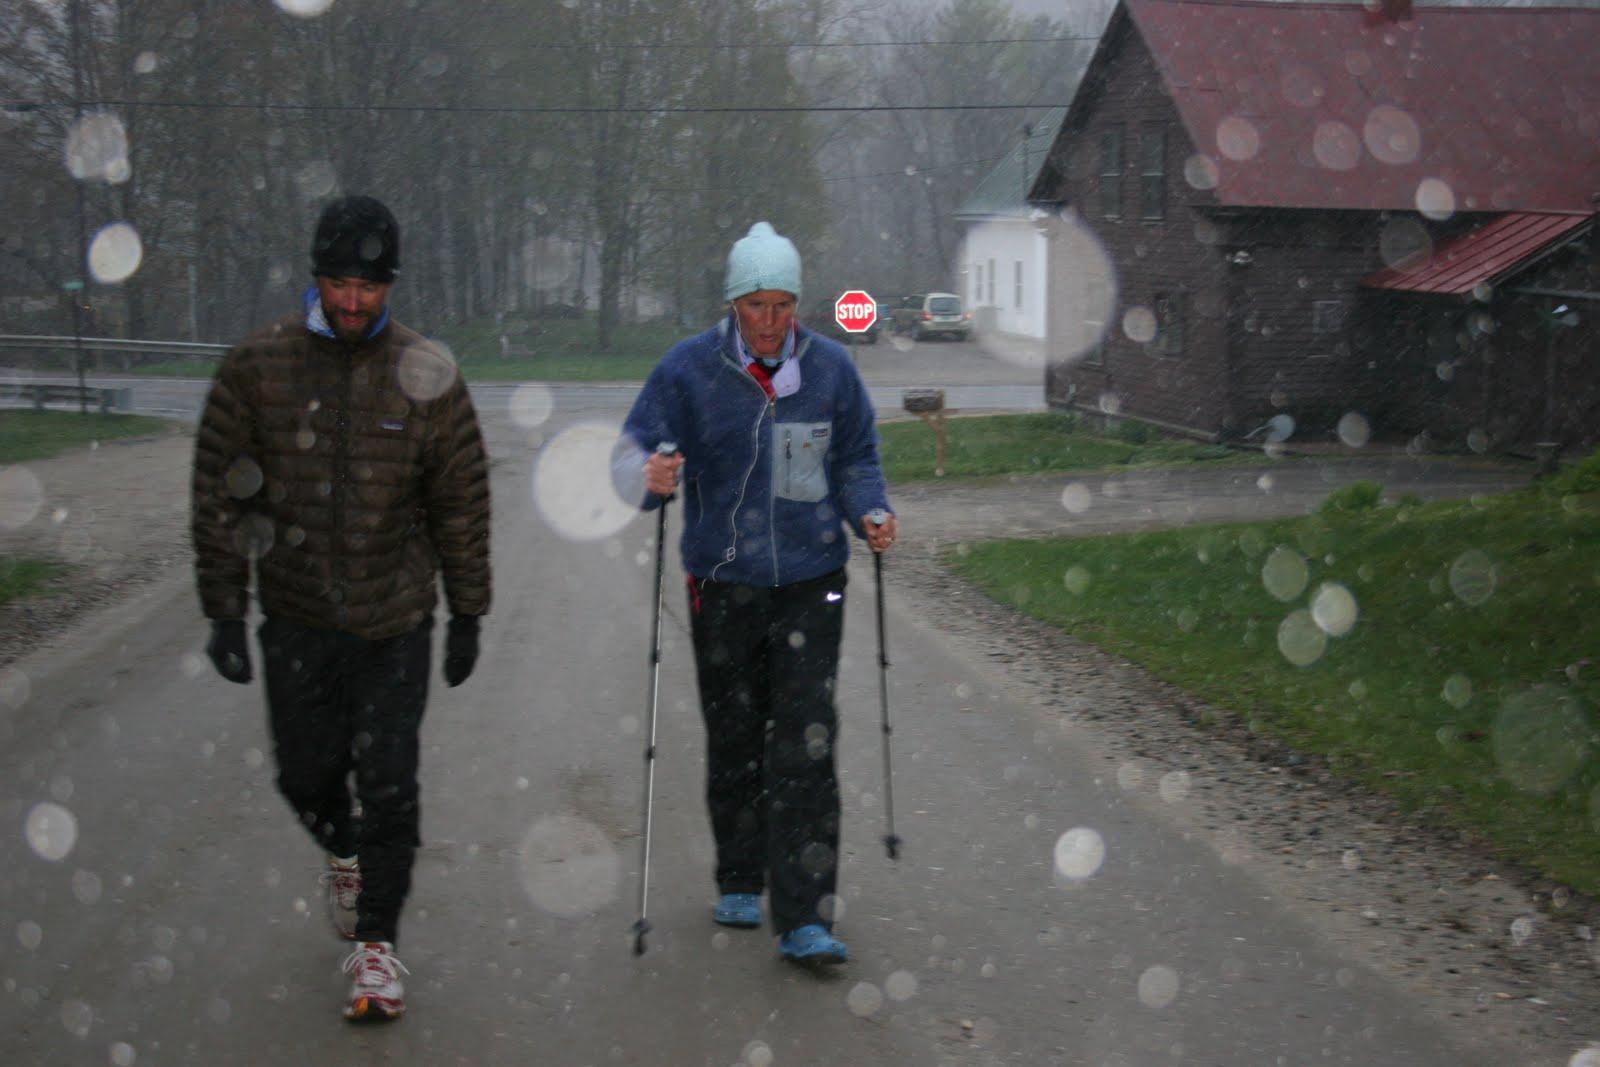 http://4.bp.blogspot.com/_Vfr7RvGSUAc/S9yikdpEKxI/AAAAAAAADLQ/hlnCv0IWv1s/s1600/VT_snow_w_spud.jpg